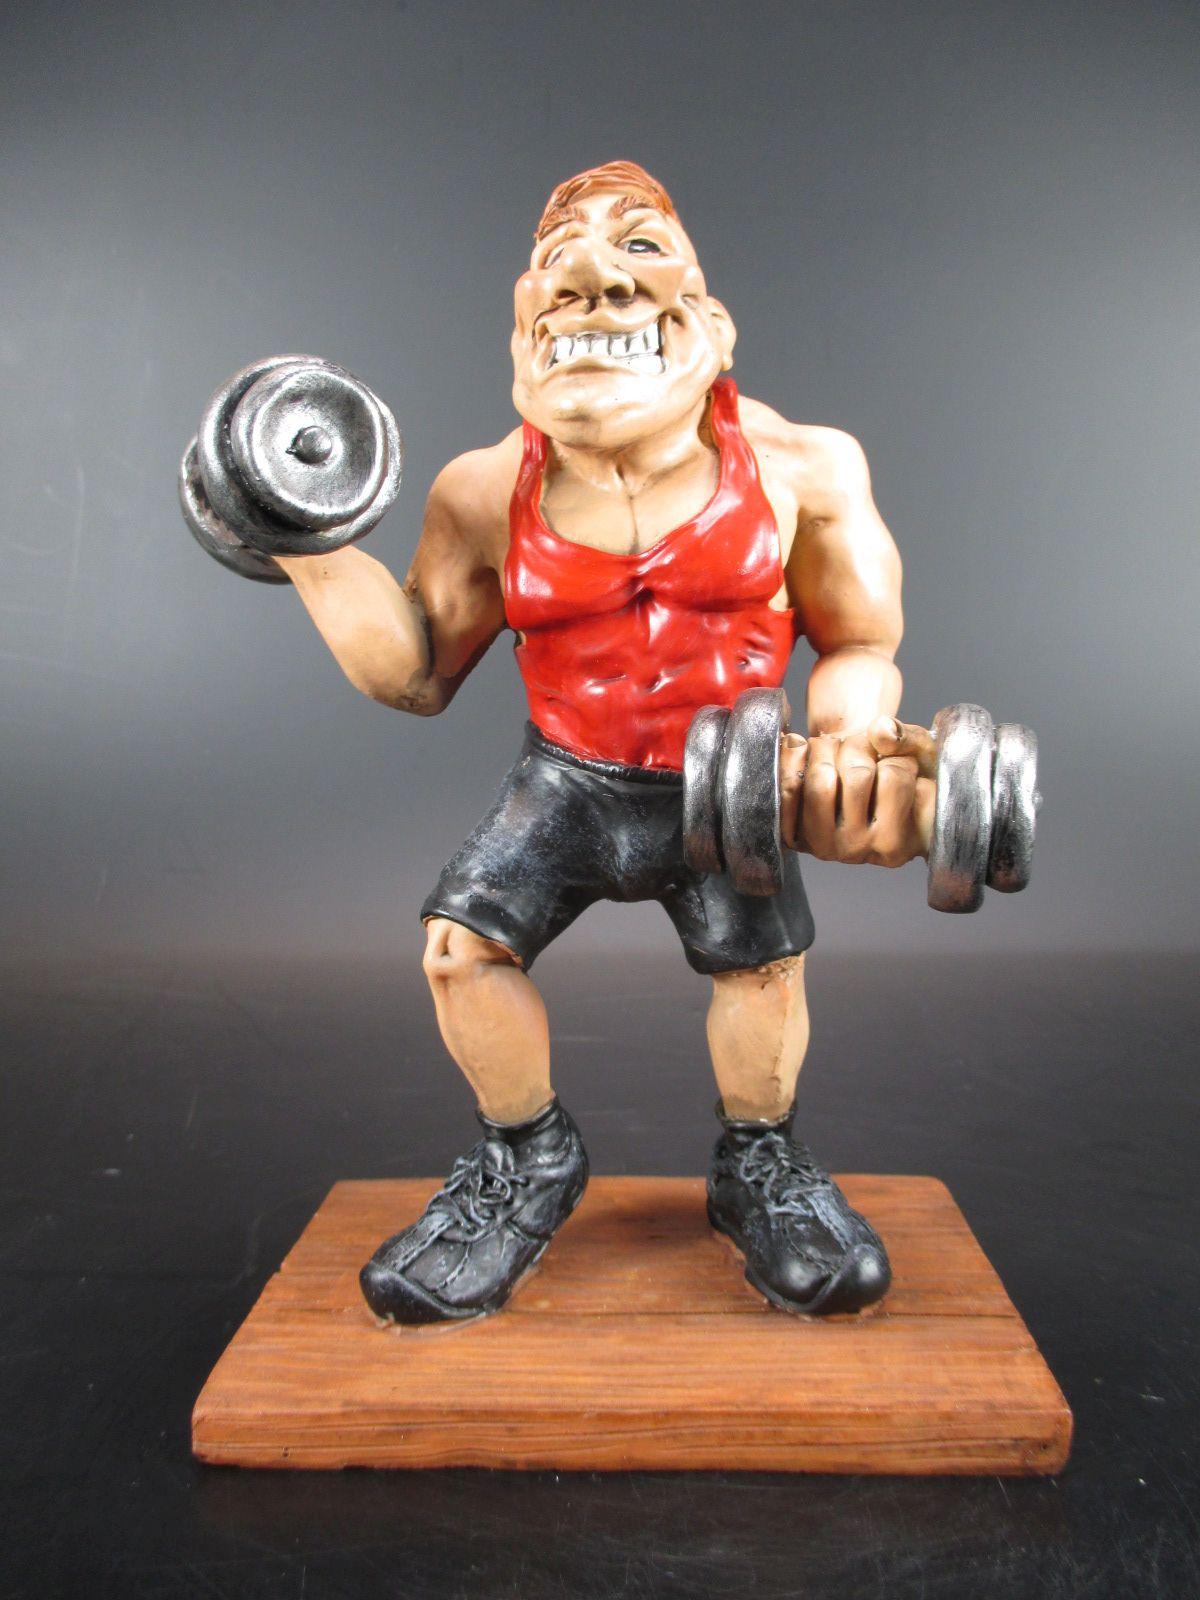 Bodybuilder Bodybuilding Fitness 18 cm Sport Funny Figur